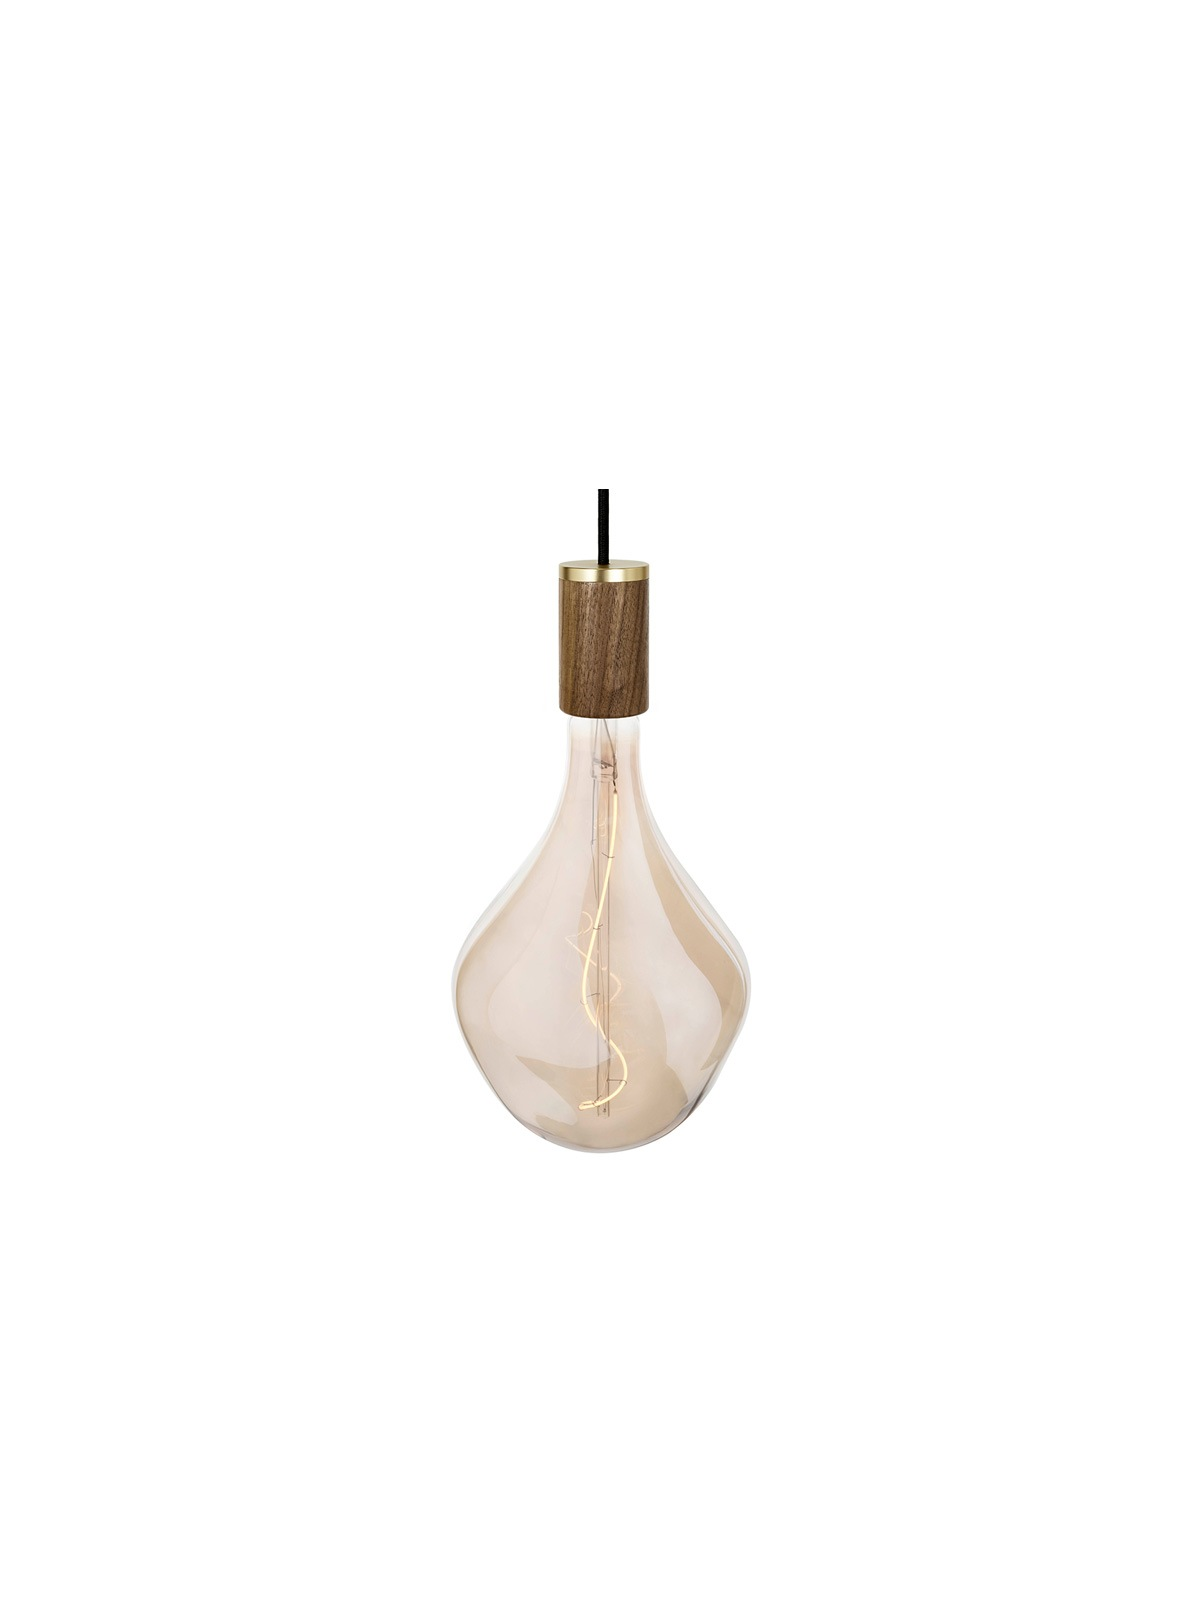 Voronoi I mundgeblasene Birne Tala DesignOrt Lampen Berlin